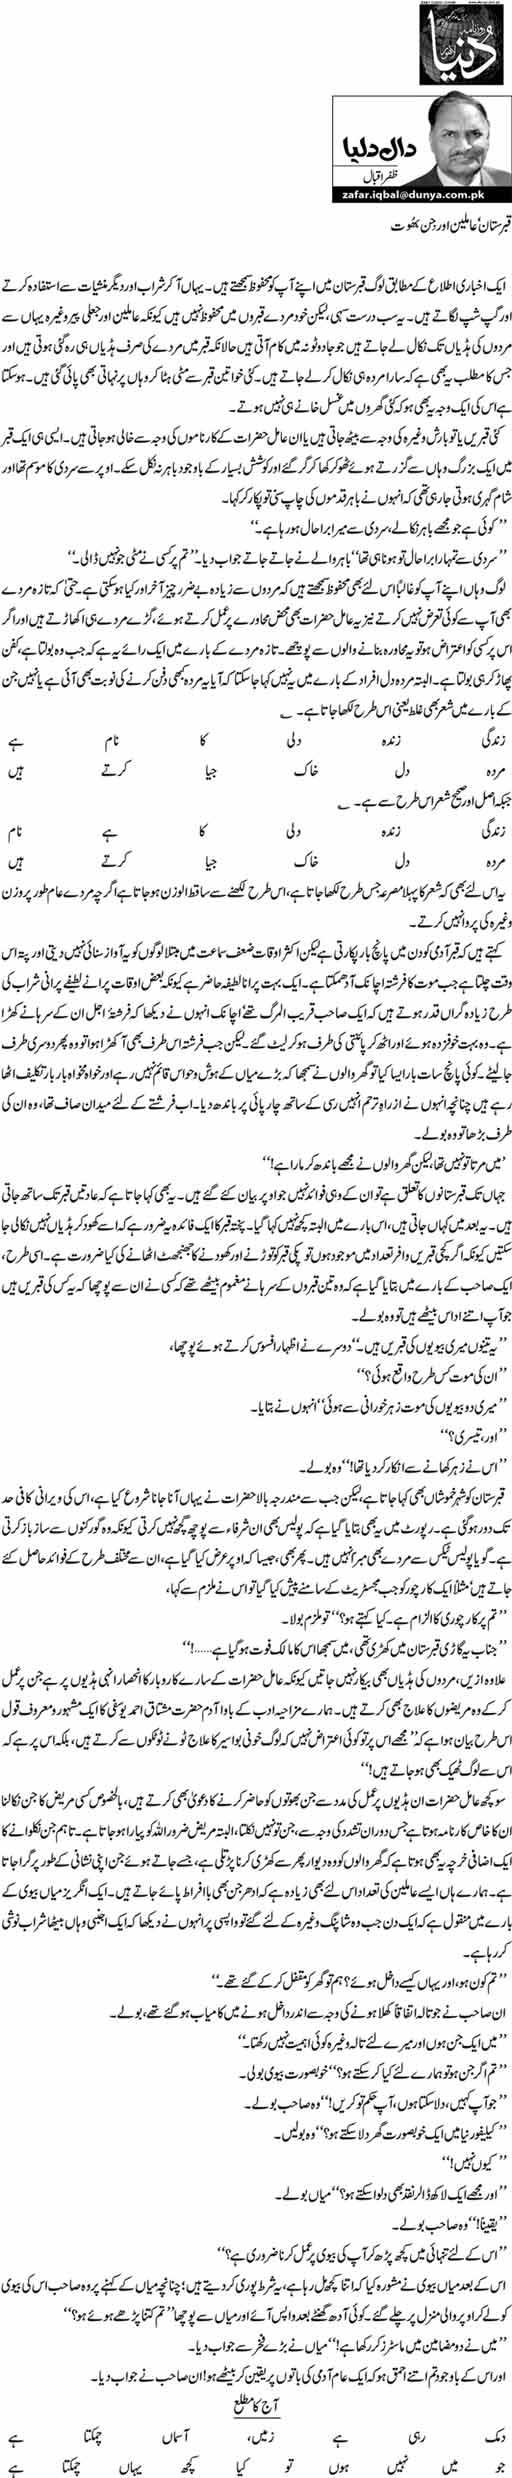 Qabristan,aamileen aur jin bhoot - Zafar Iqbal